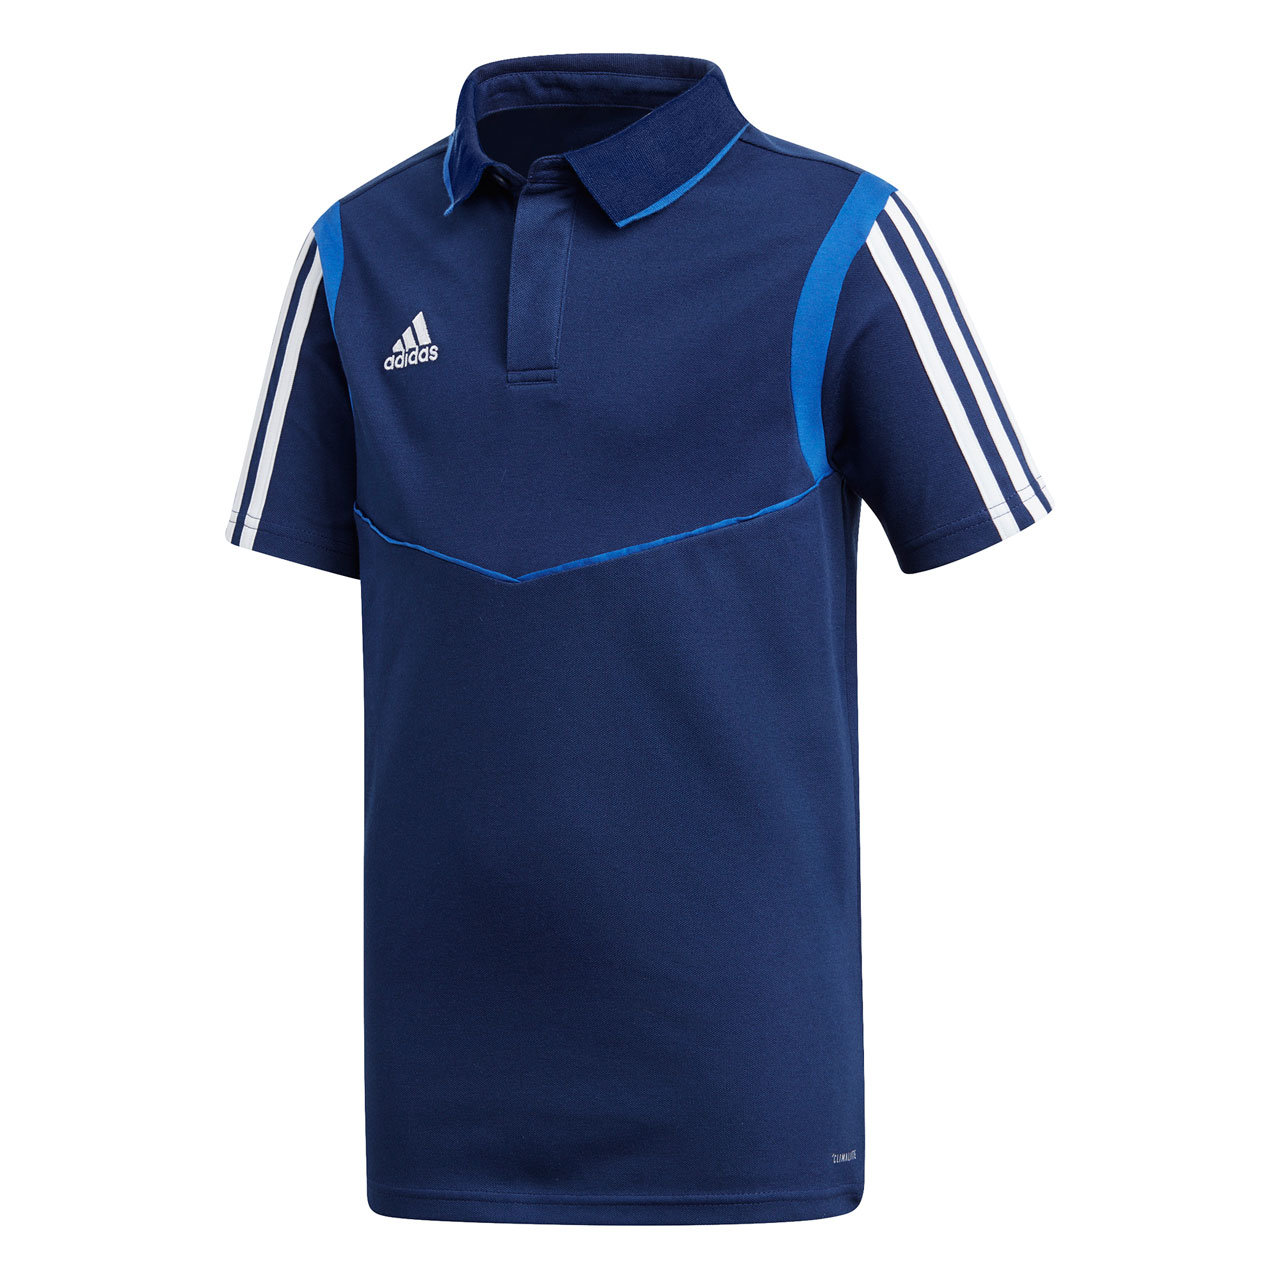 adidas TIRO19 CO Polo Youth Baumwoll Polo Shirt Kinder